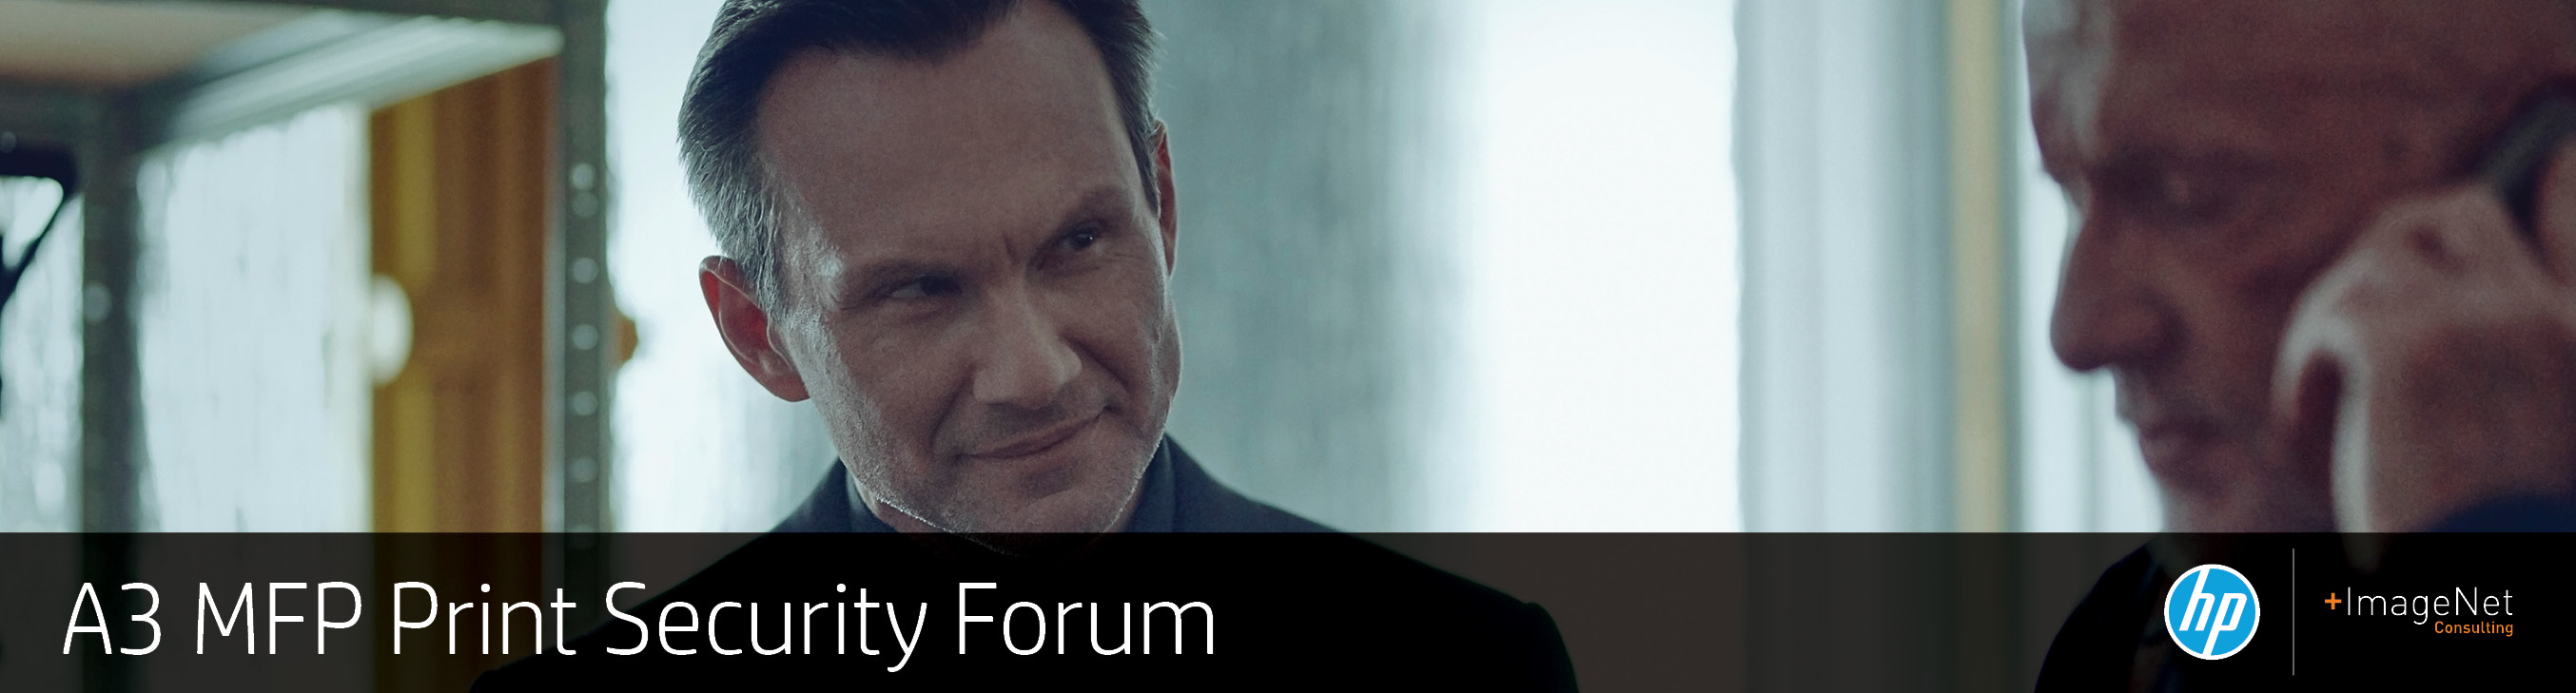 A3 MFP Print Security Forum